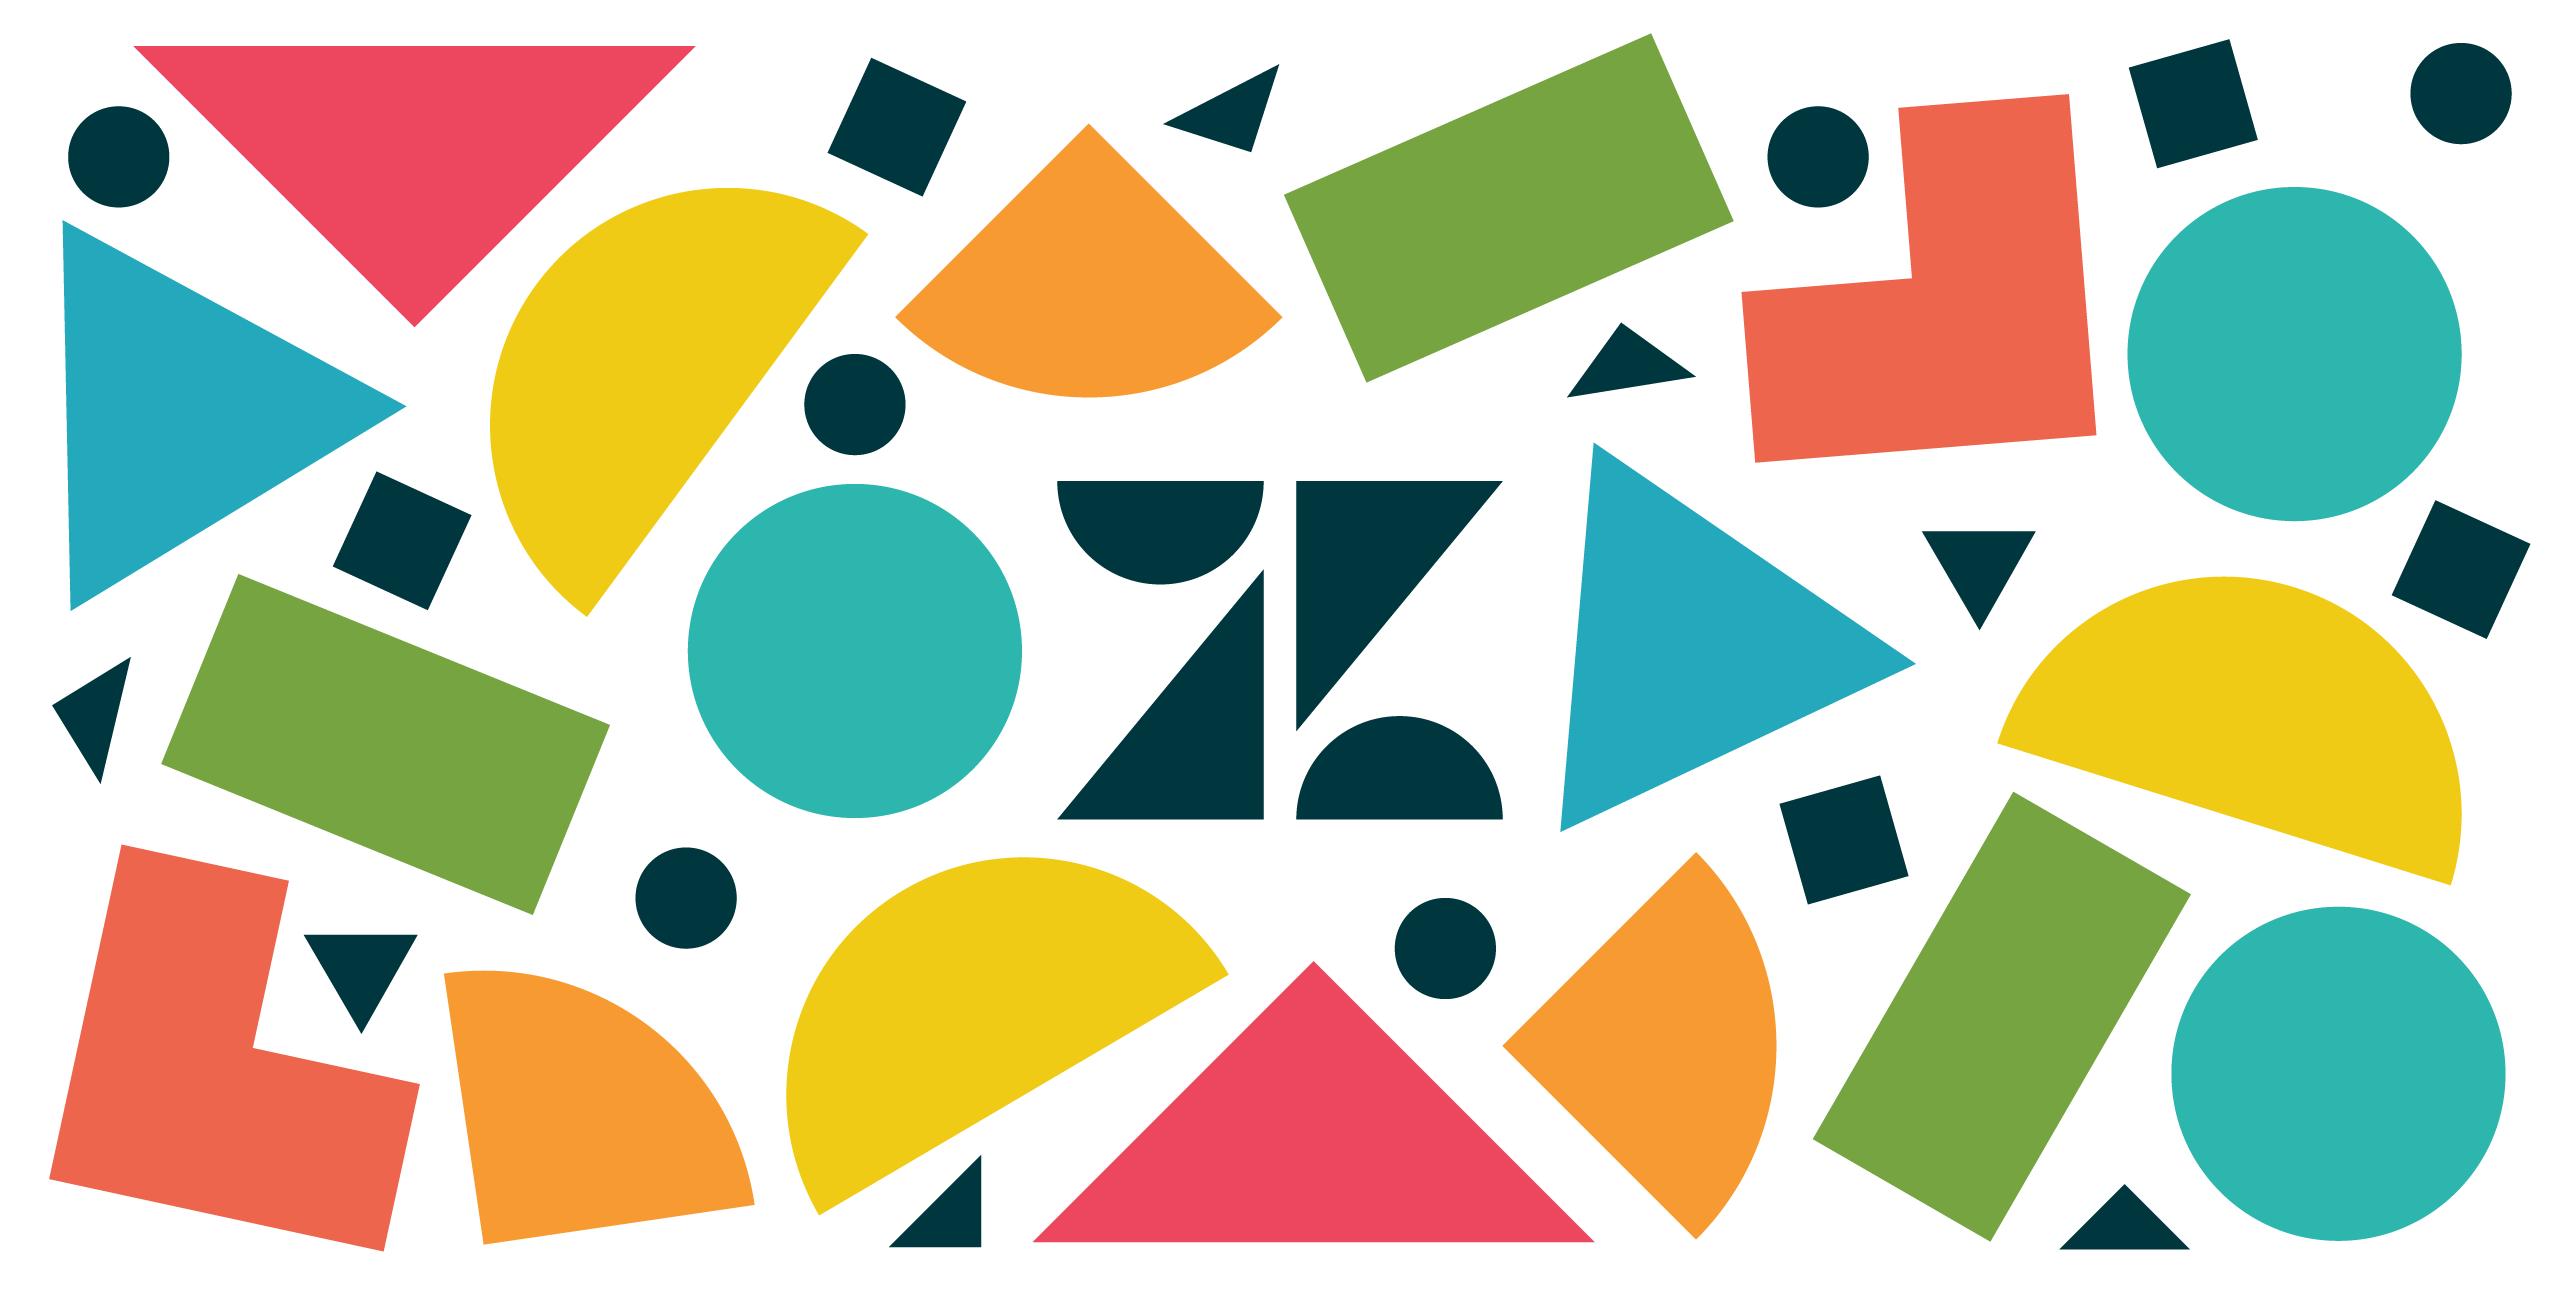 https://hypernovalabs.com/wp-content/uploads/2019/03/Ultimas_funcionalidades_zendesk.png